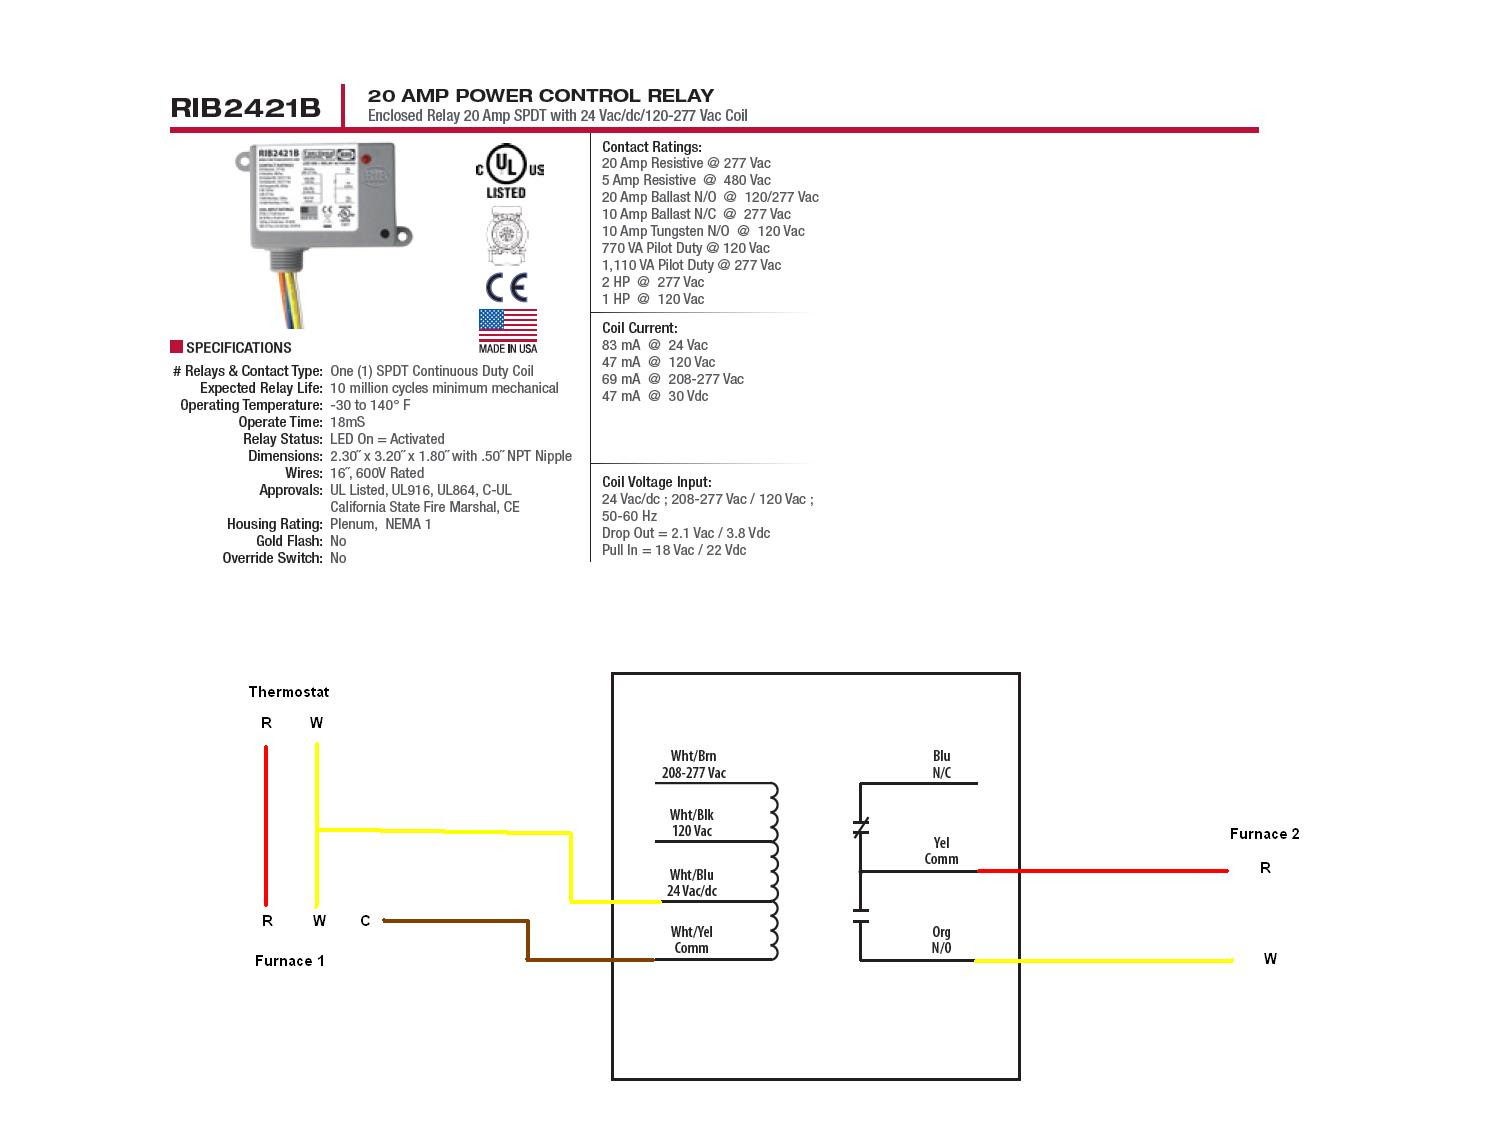 Diagram Gas Furnace Relay Wiring Diagram Full Version Hd Quality Wiring Diagram Circutdiagram Gtve It